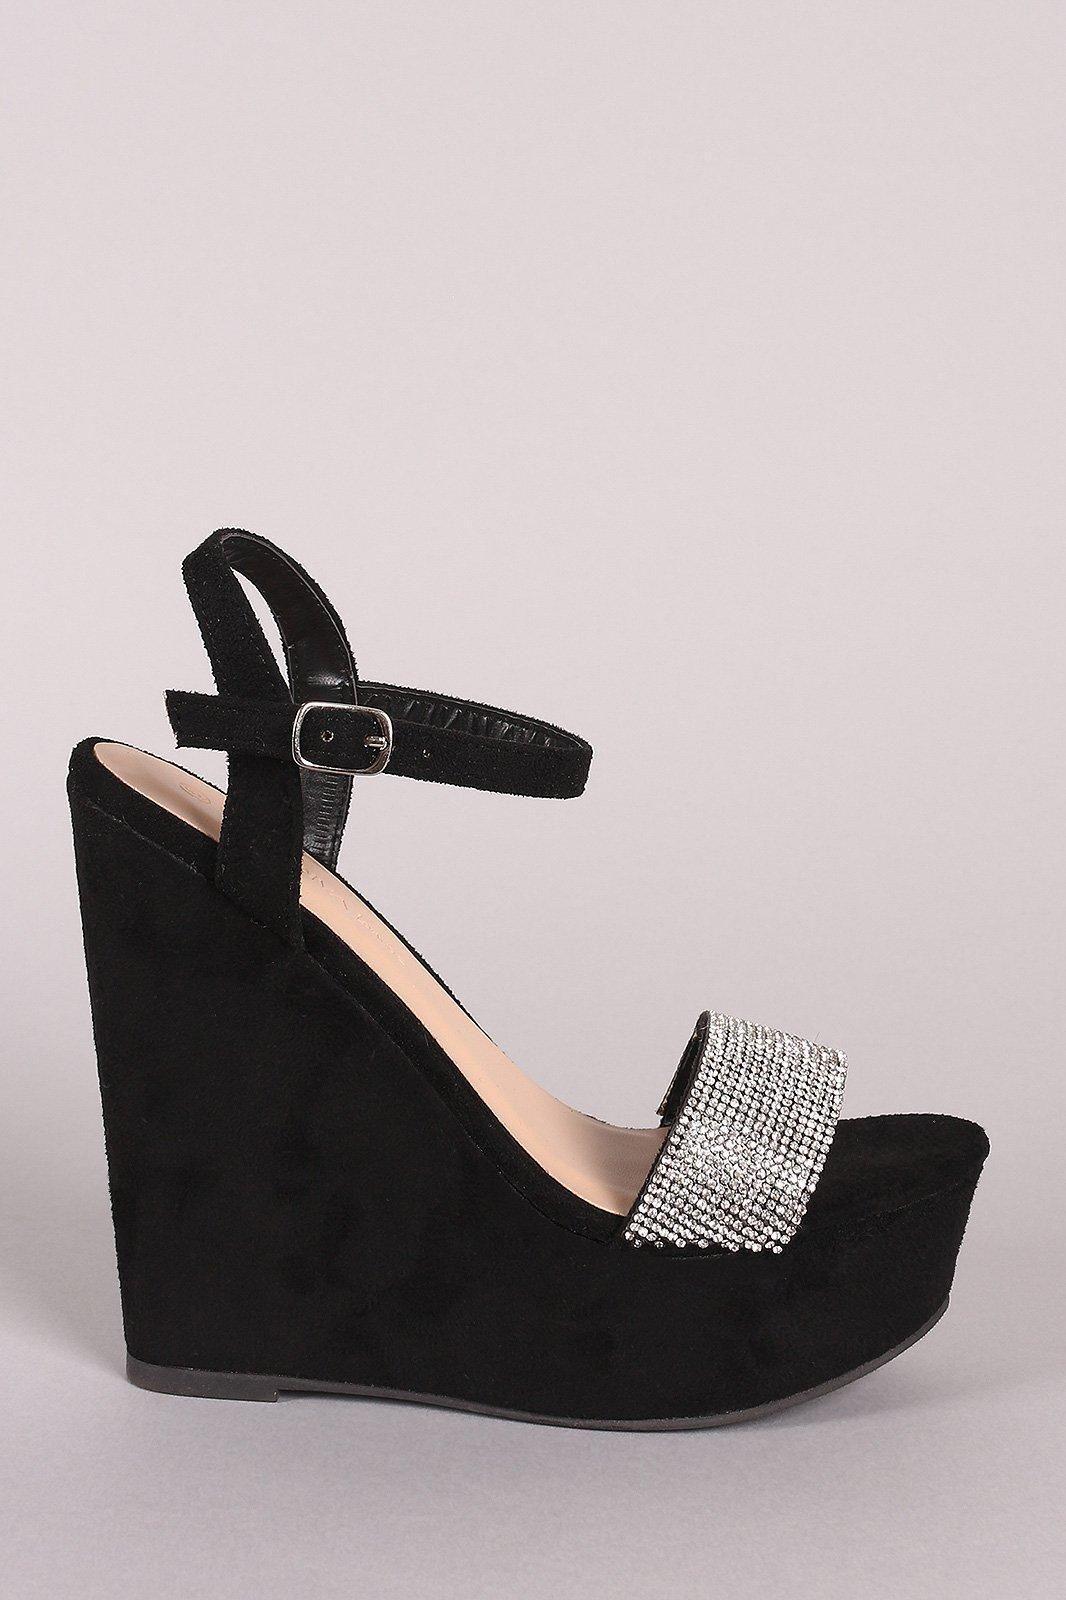 5a151b6b5 Wild Diva Lounge Suede Rhinestone Ankle Strap Platform Wedge